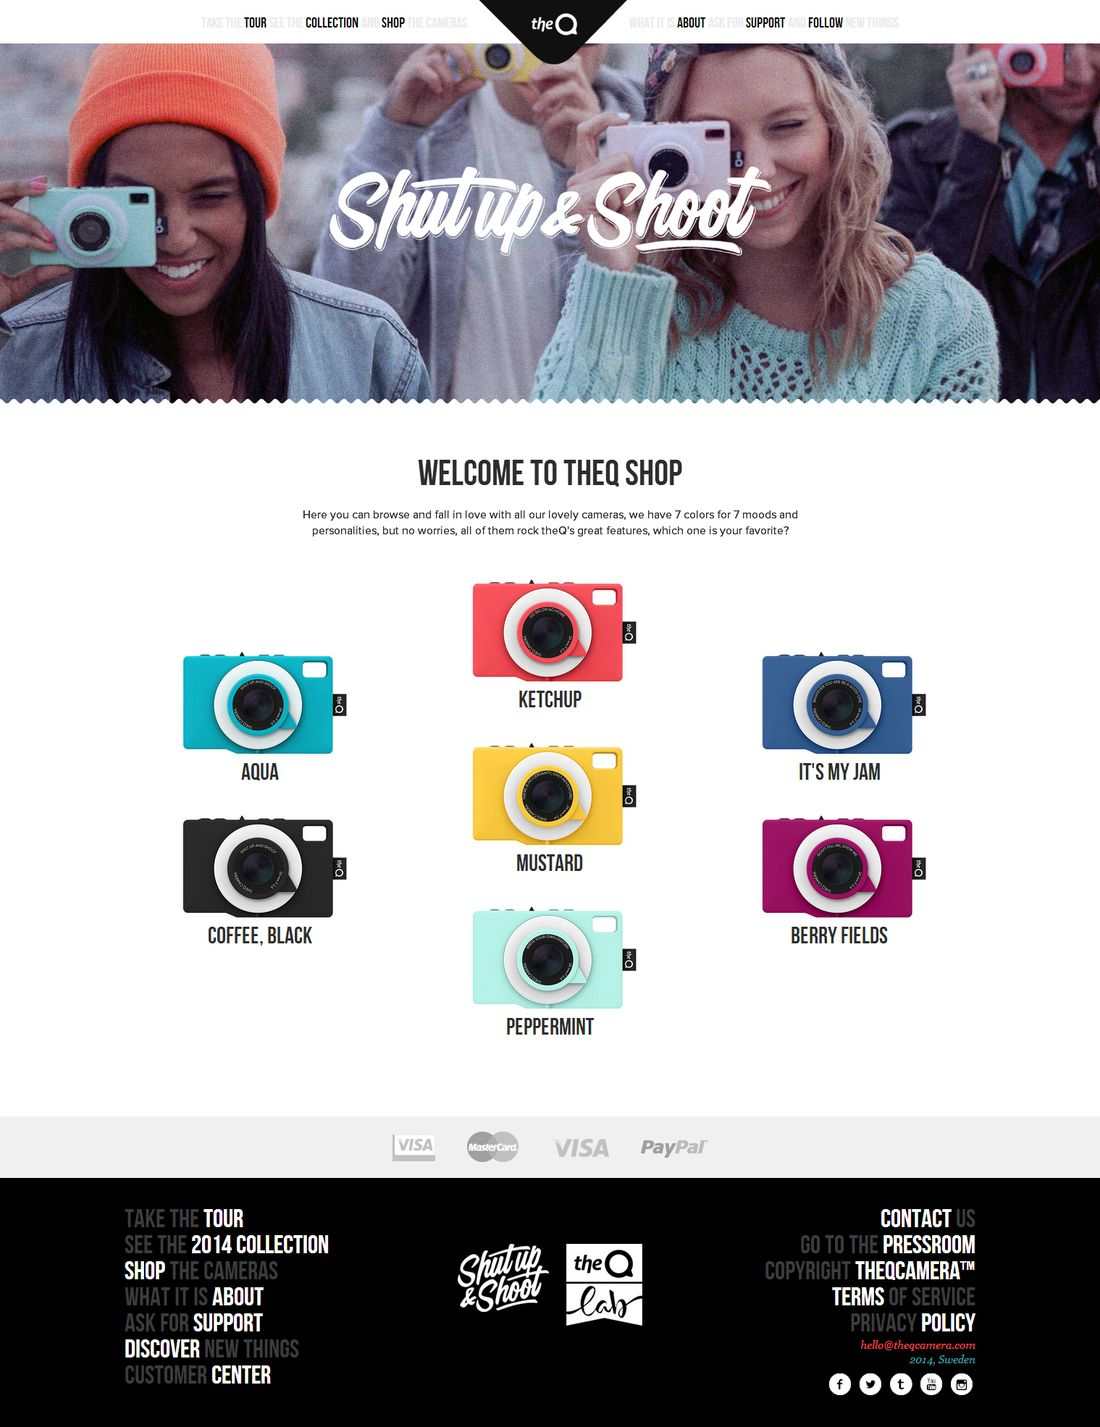 TheQ Camera - 2